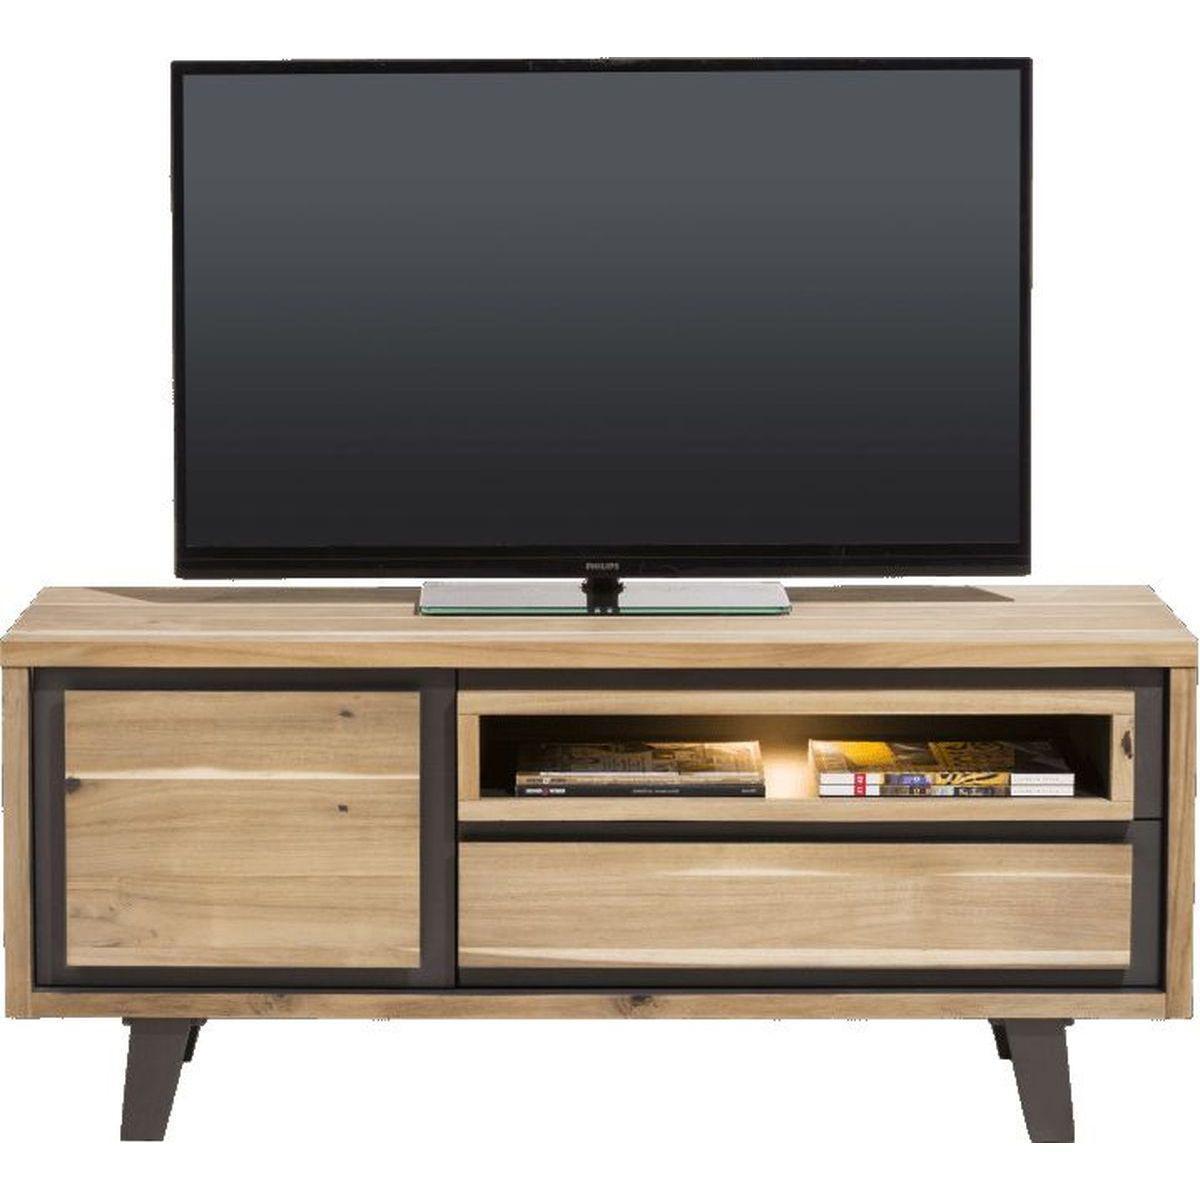 Lowboard PRATO H&H 140cm